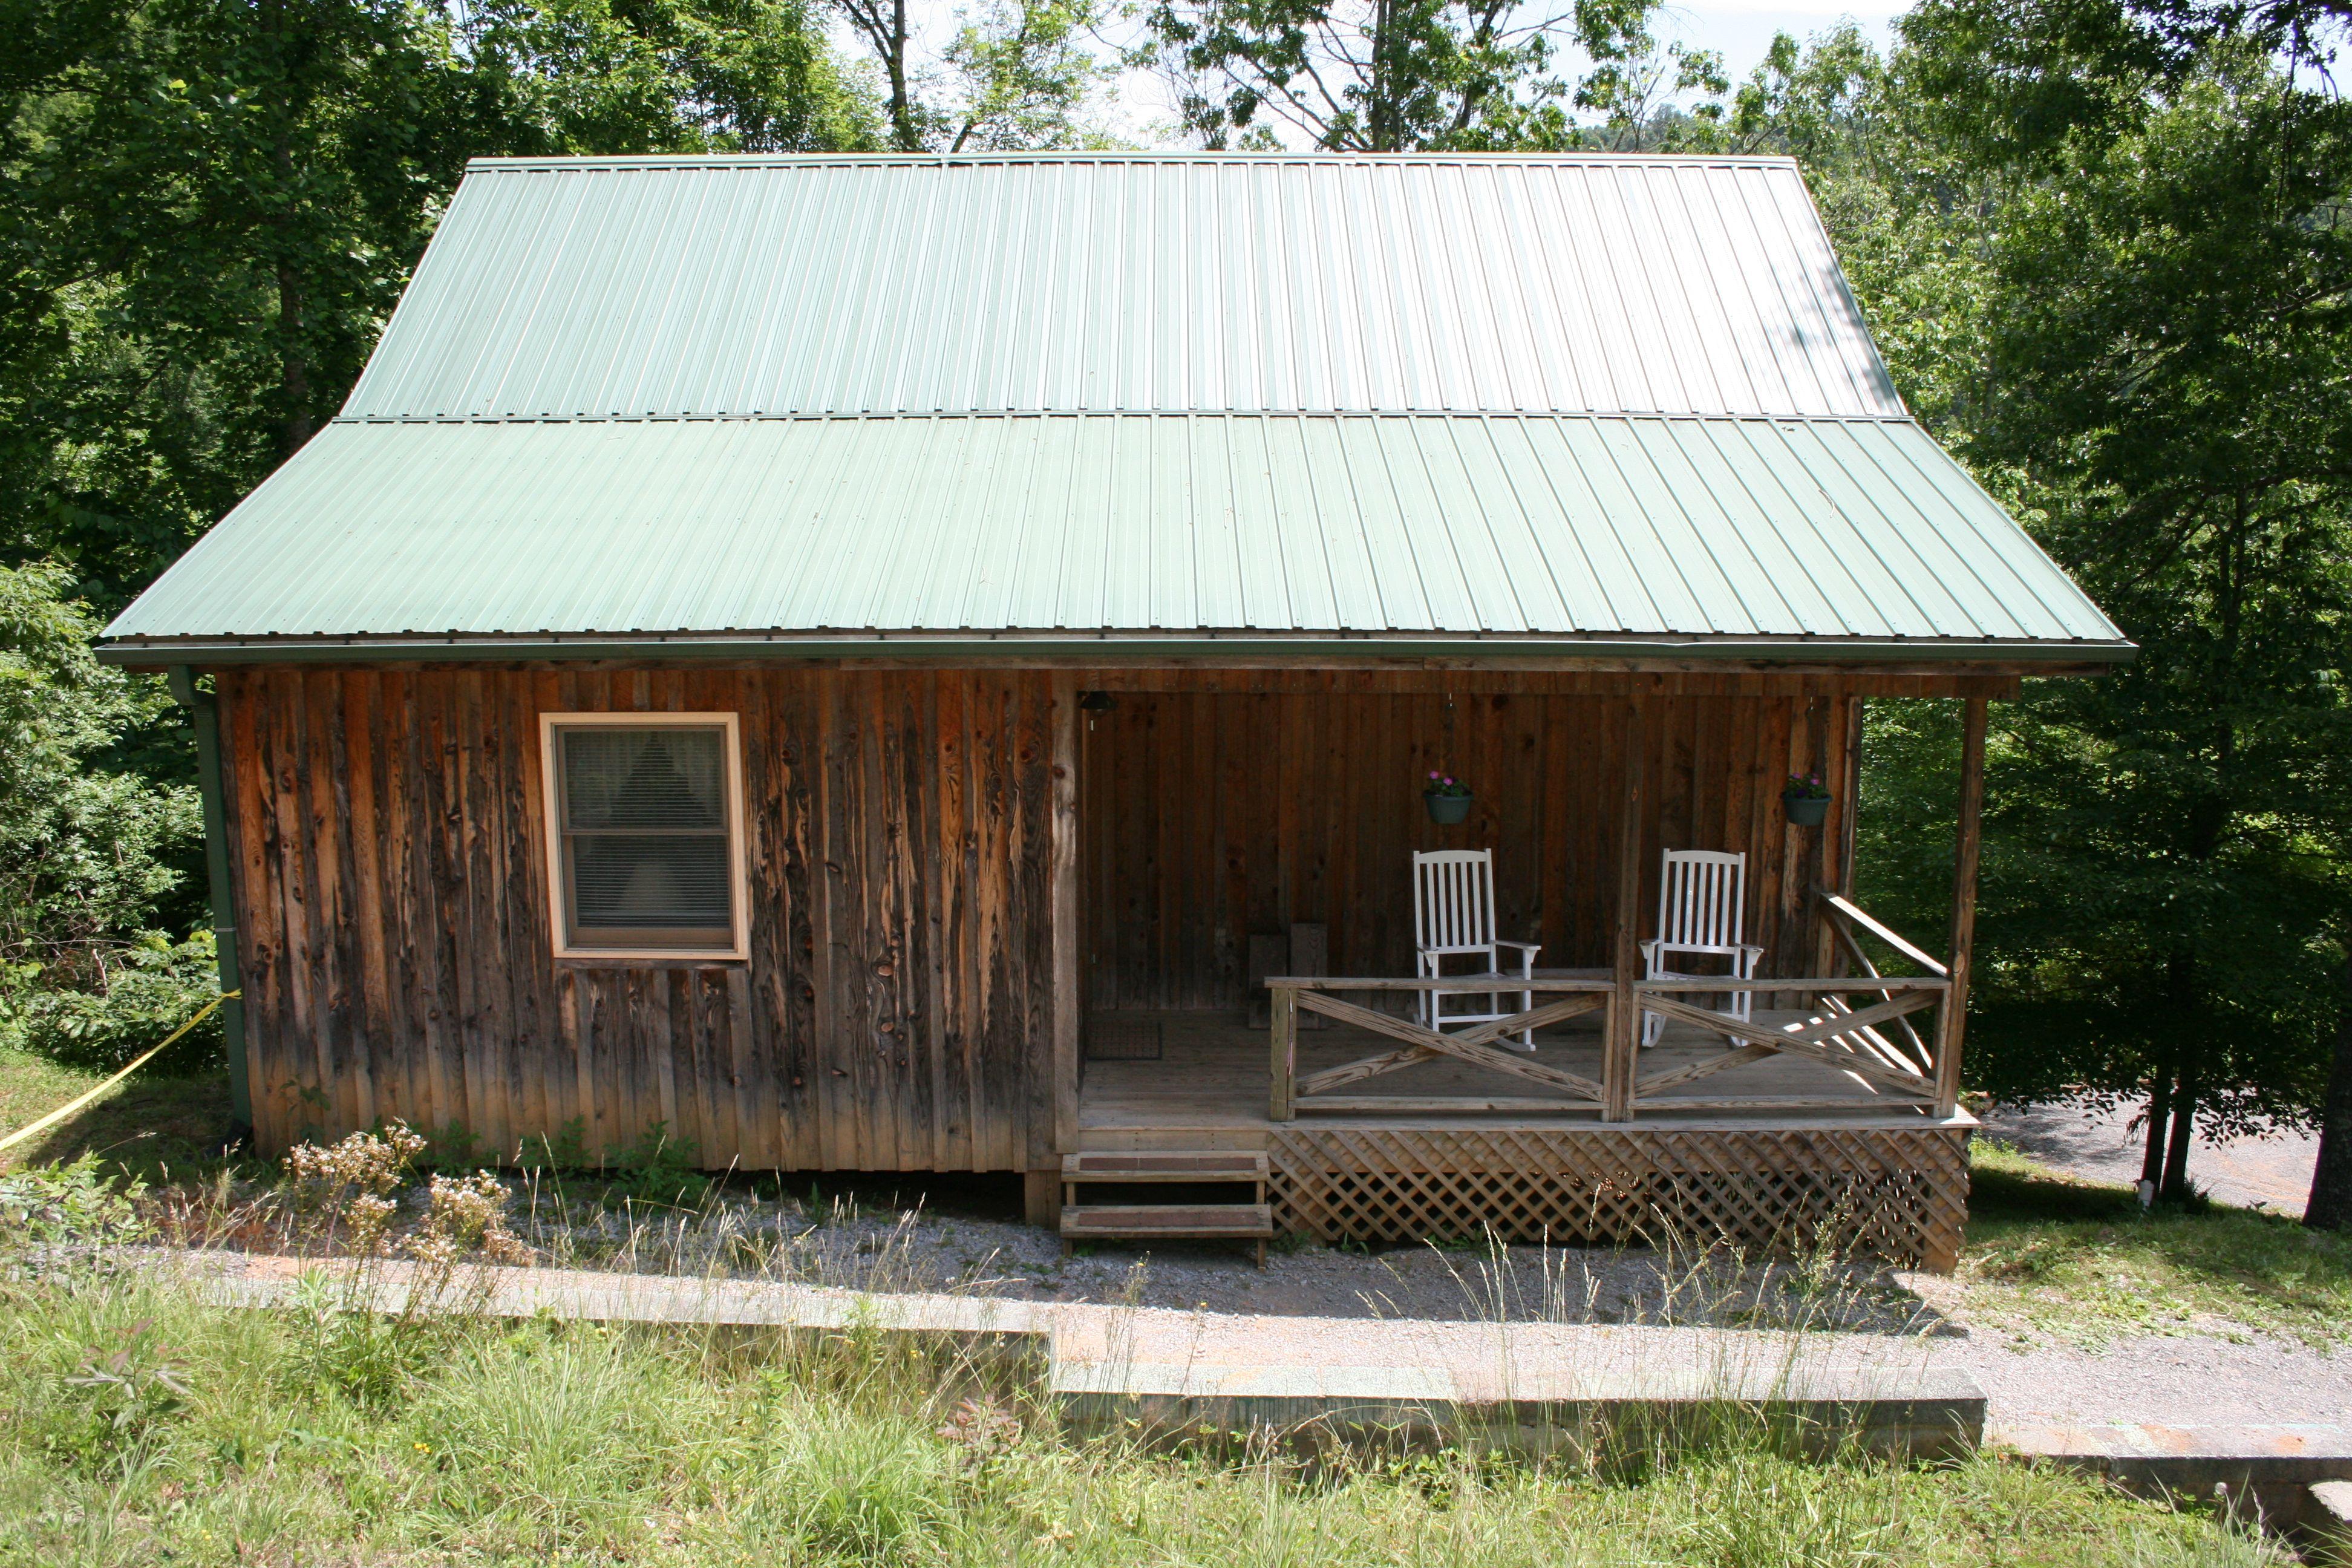 mountain cabin in cabins ridge inspiration nc log pyt blue home brevard bathroom virginia carolina north mountains